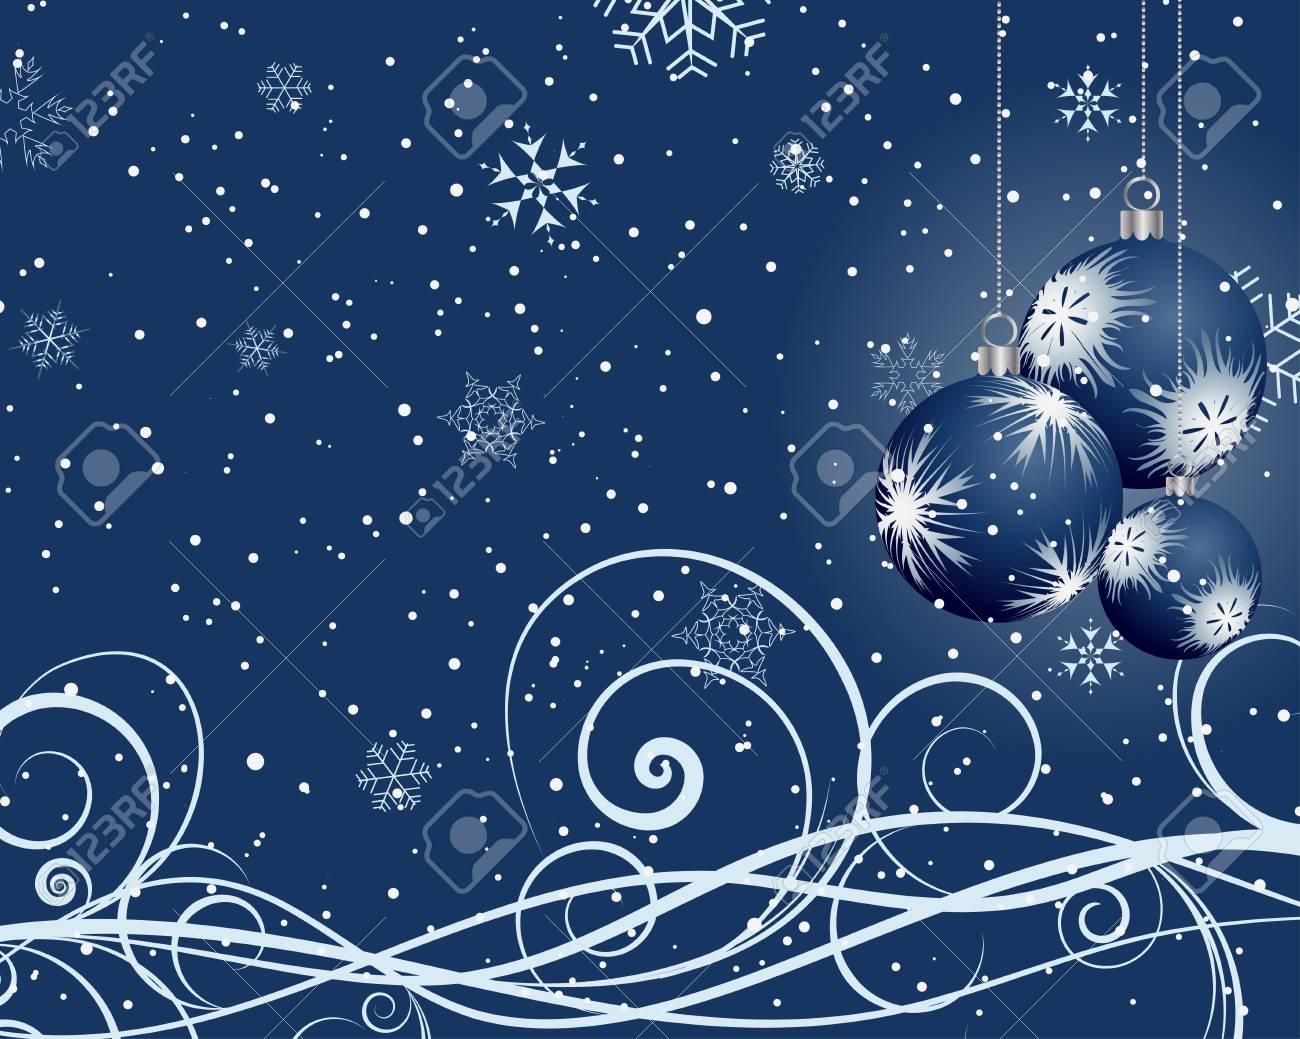 Beautiful Christmas (New Year) card. illustration. Stock Vector - 16641691